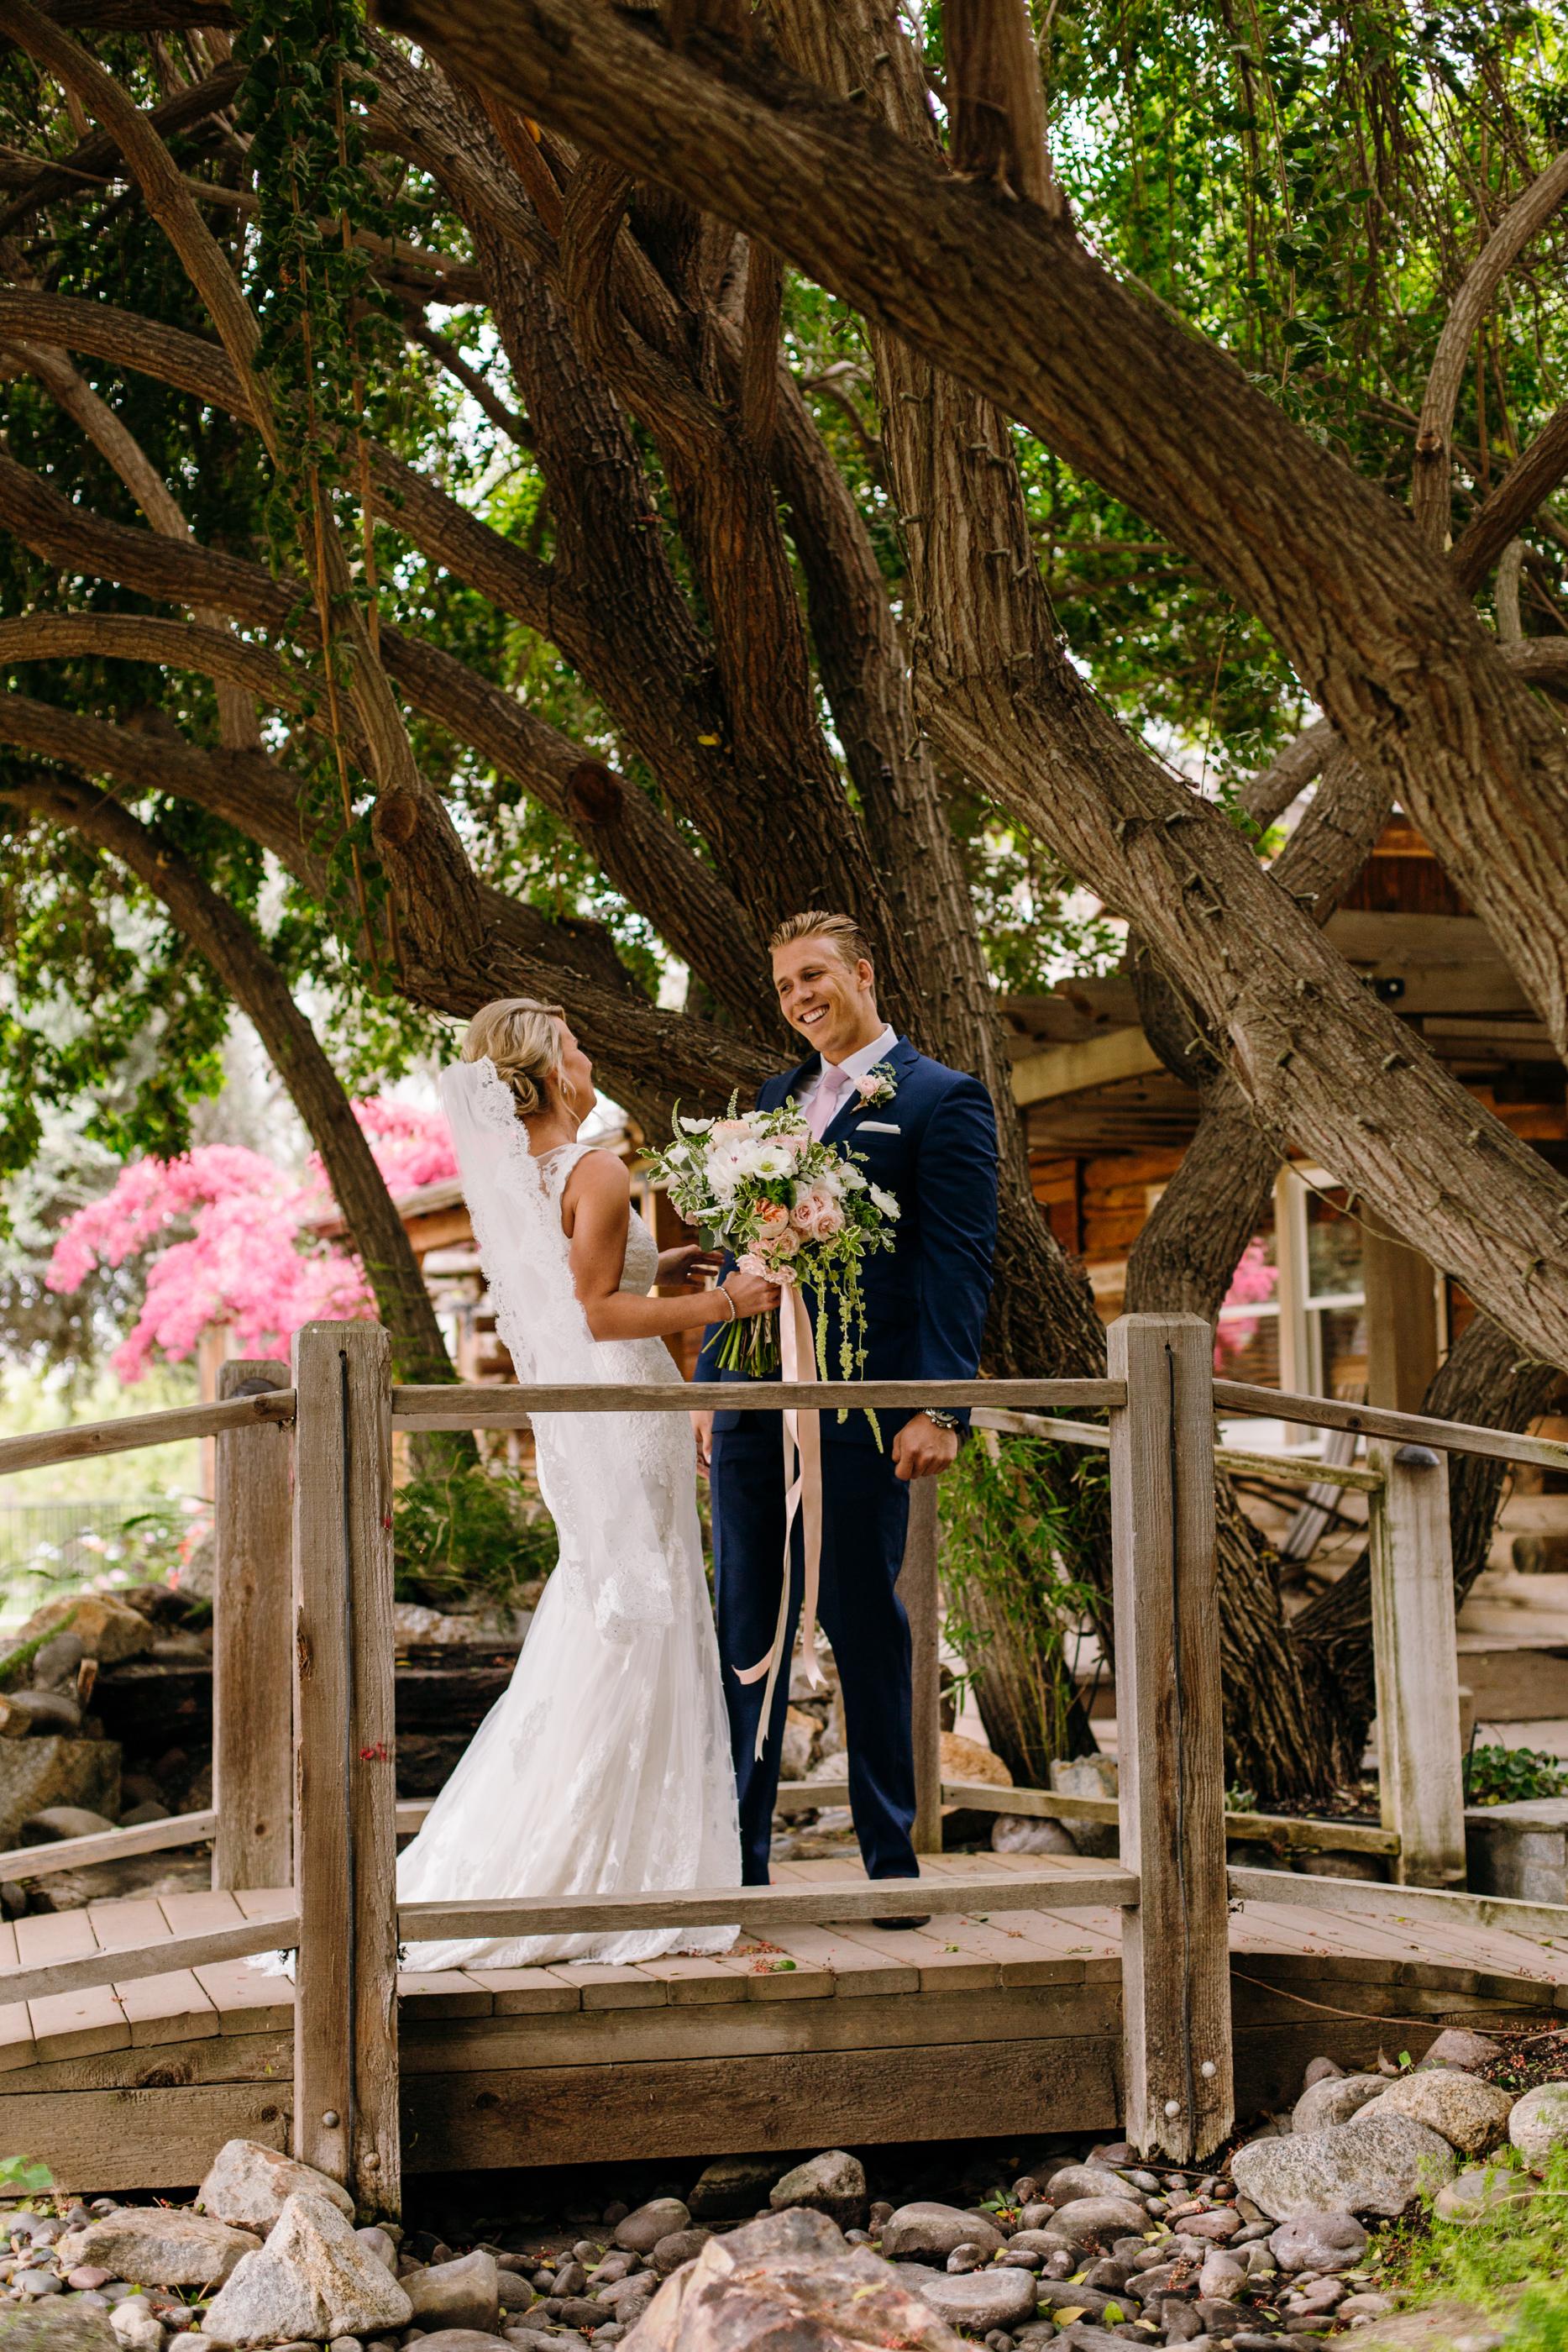 KaraNixonWeddings-LakeOakMeadows-Temecula-Wedding-16.jpg